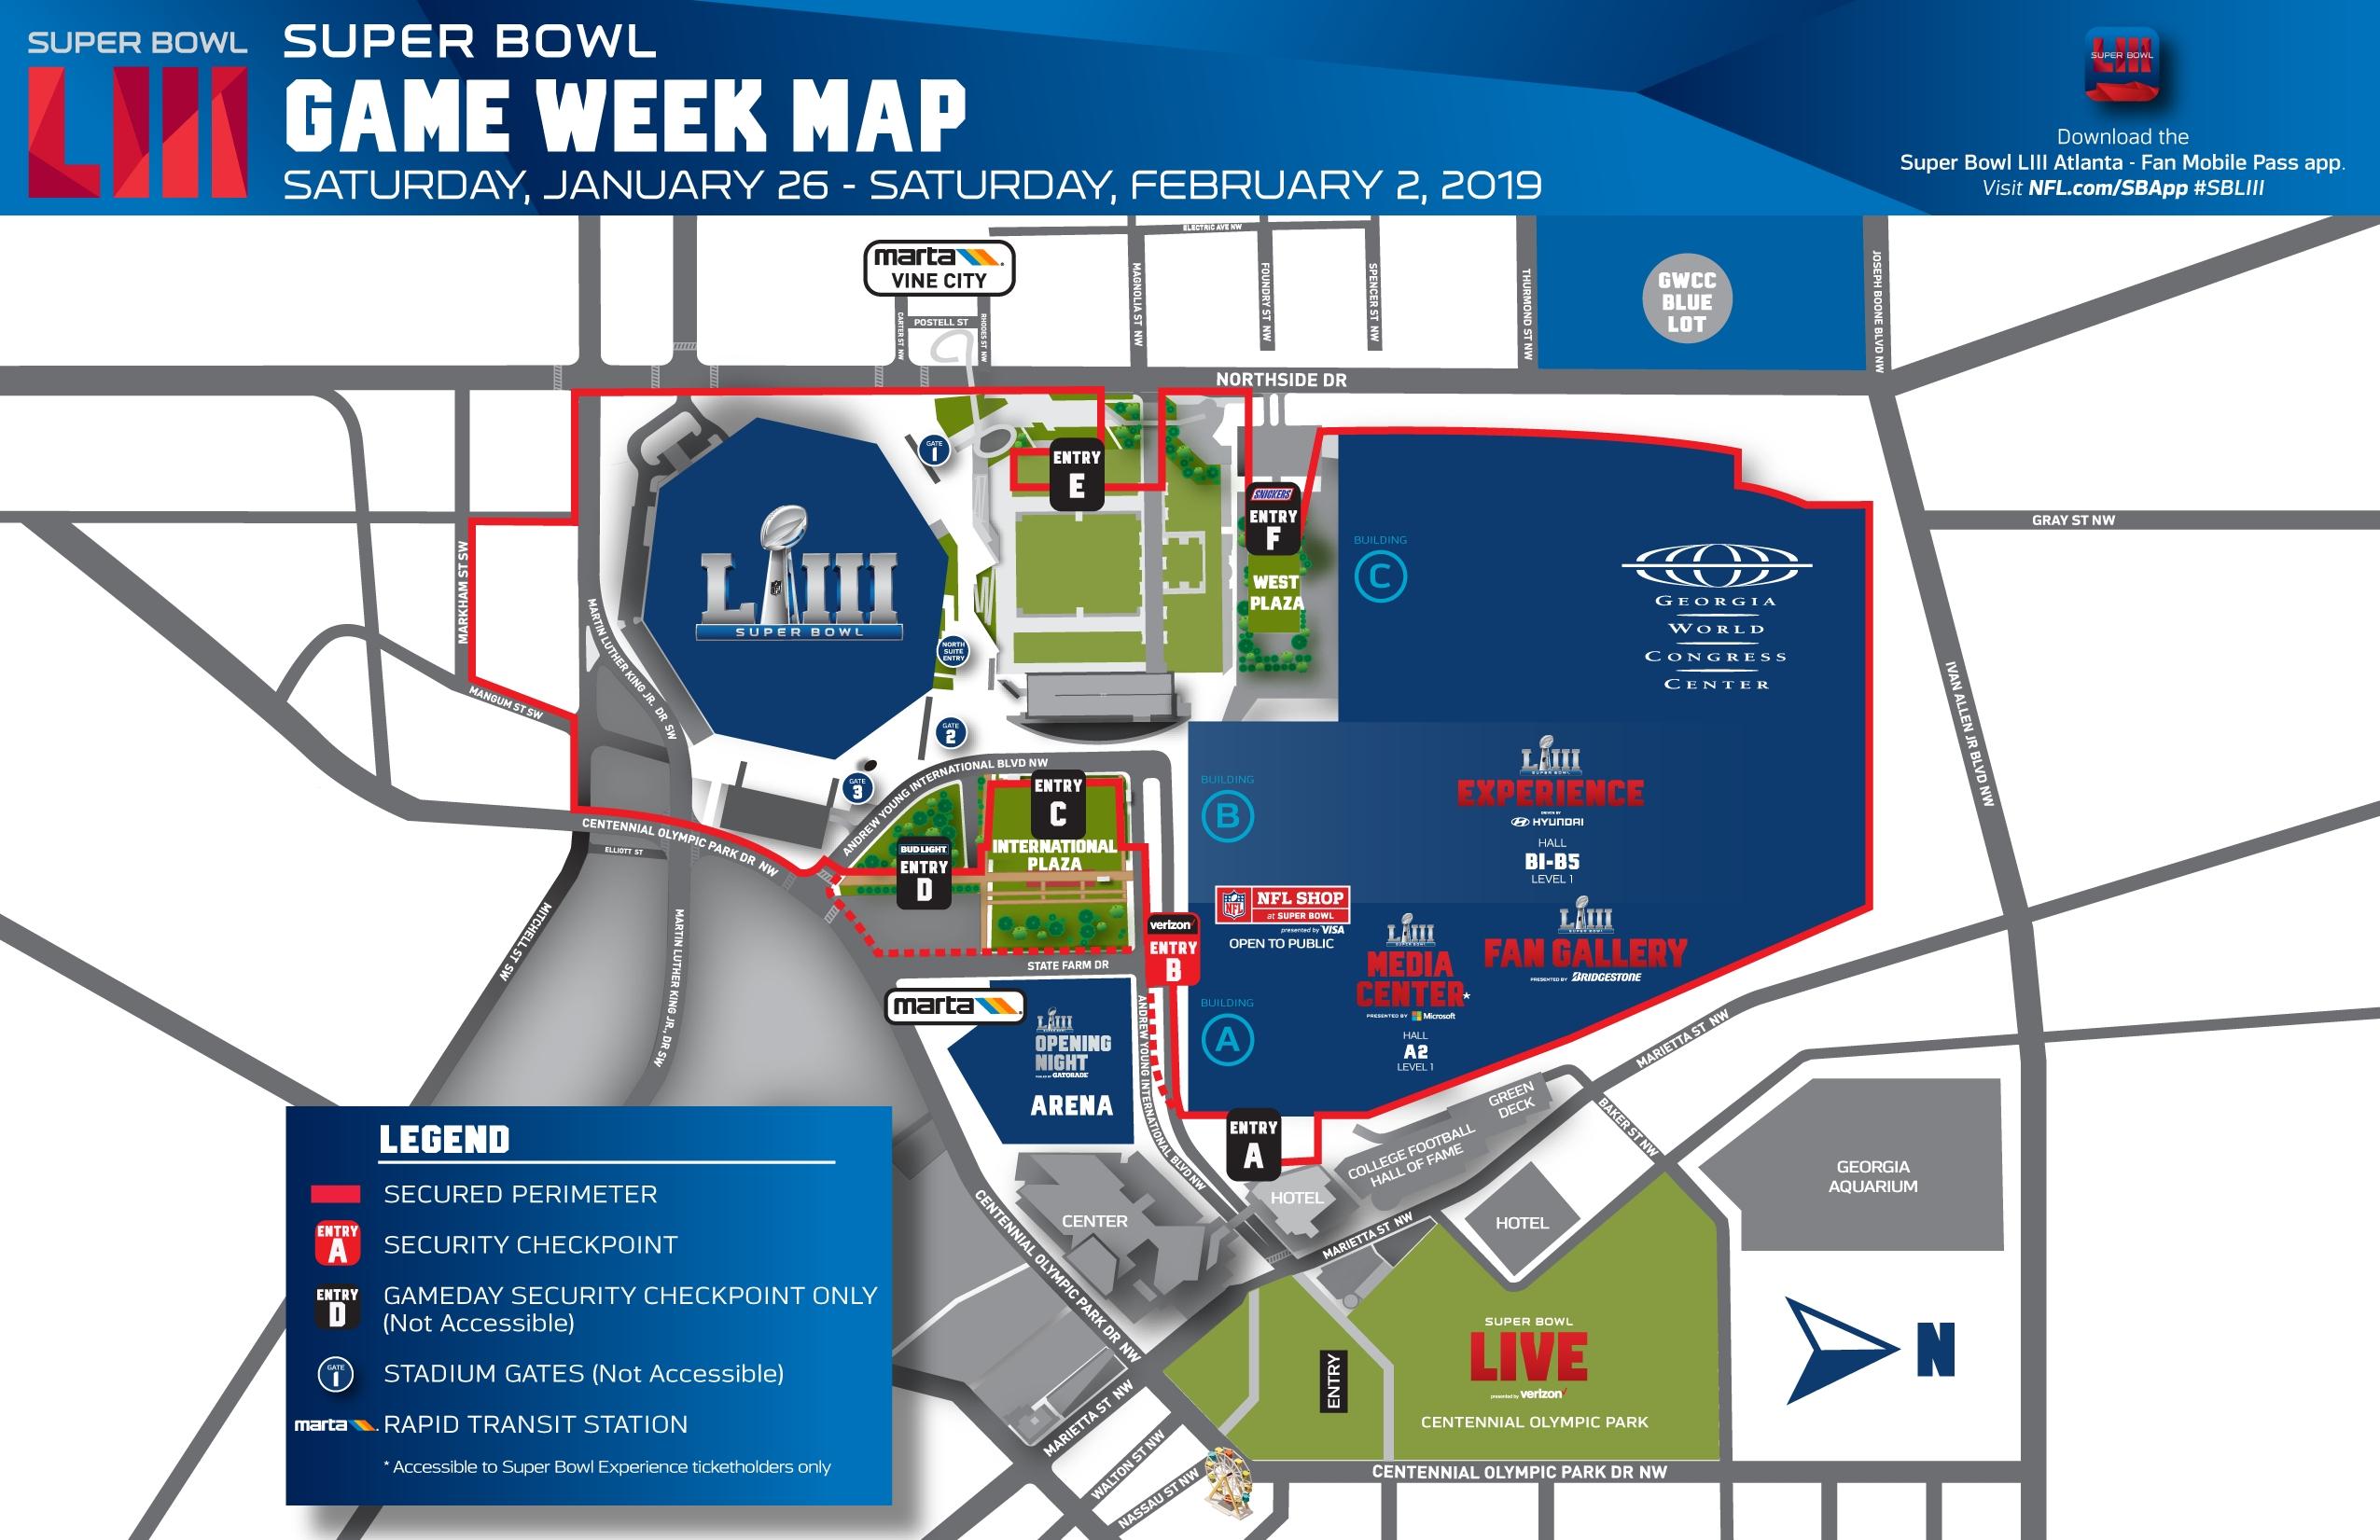 Super Bowl Hub - Mercedes Benz Stadium in Atlanta Super Bowl Stadium Seating Chart